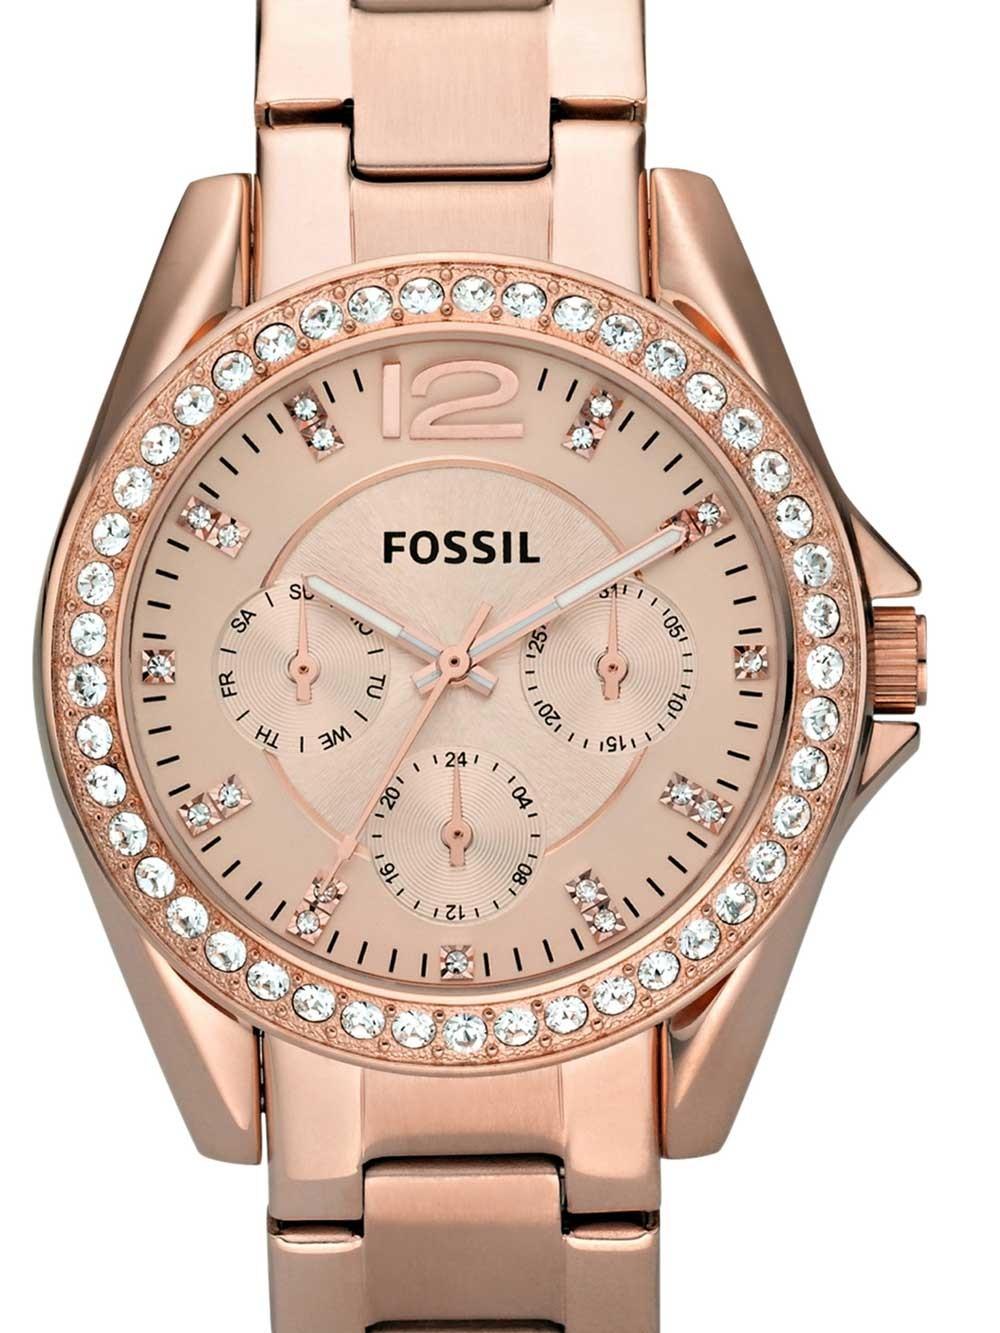 watches chrono12 fossil es2811 riley damen 38mm 10atm. Black Bedroom Furniture Sets. Home Design Ideas